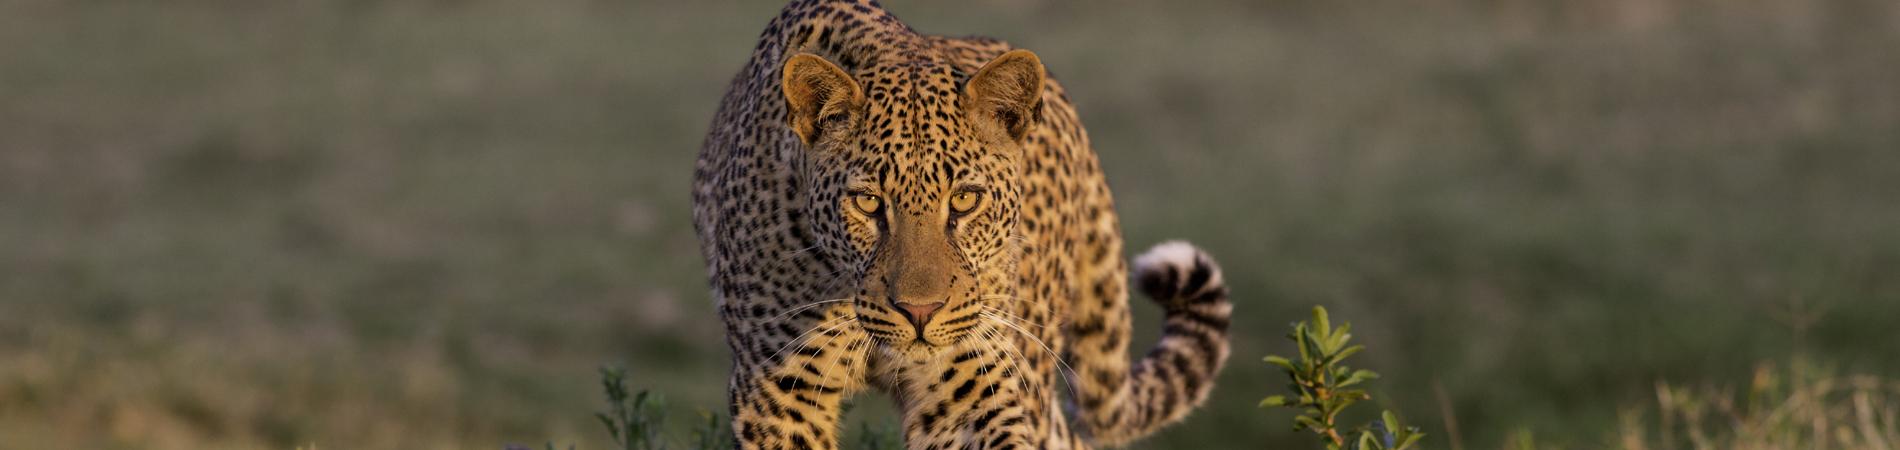 shutterstock_leopard luangwa header